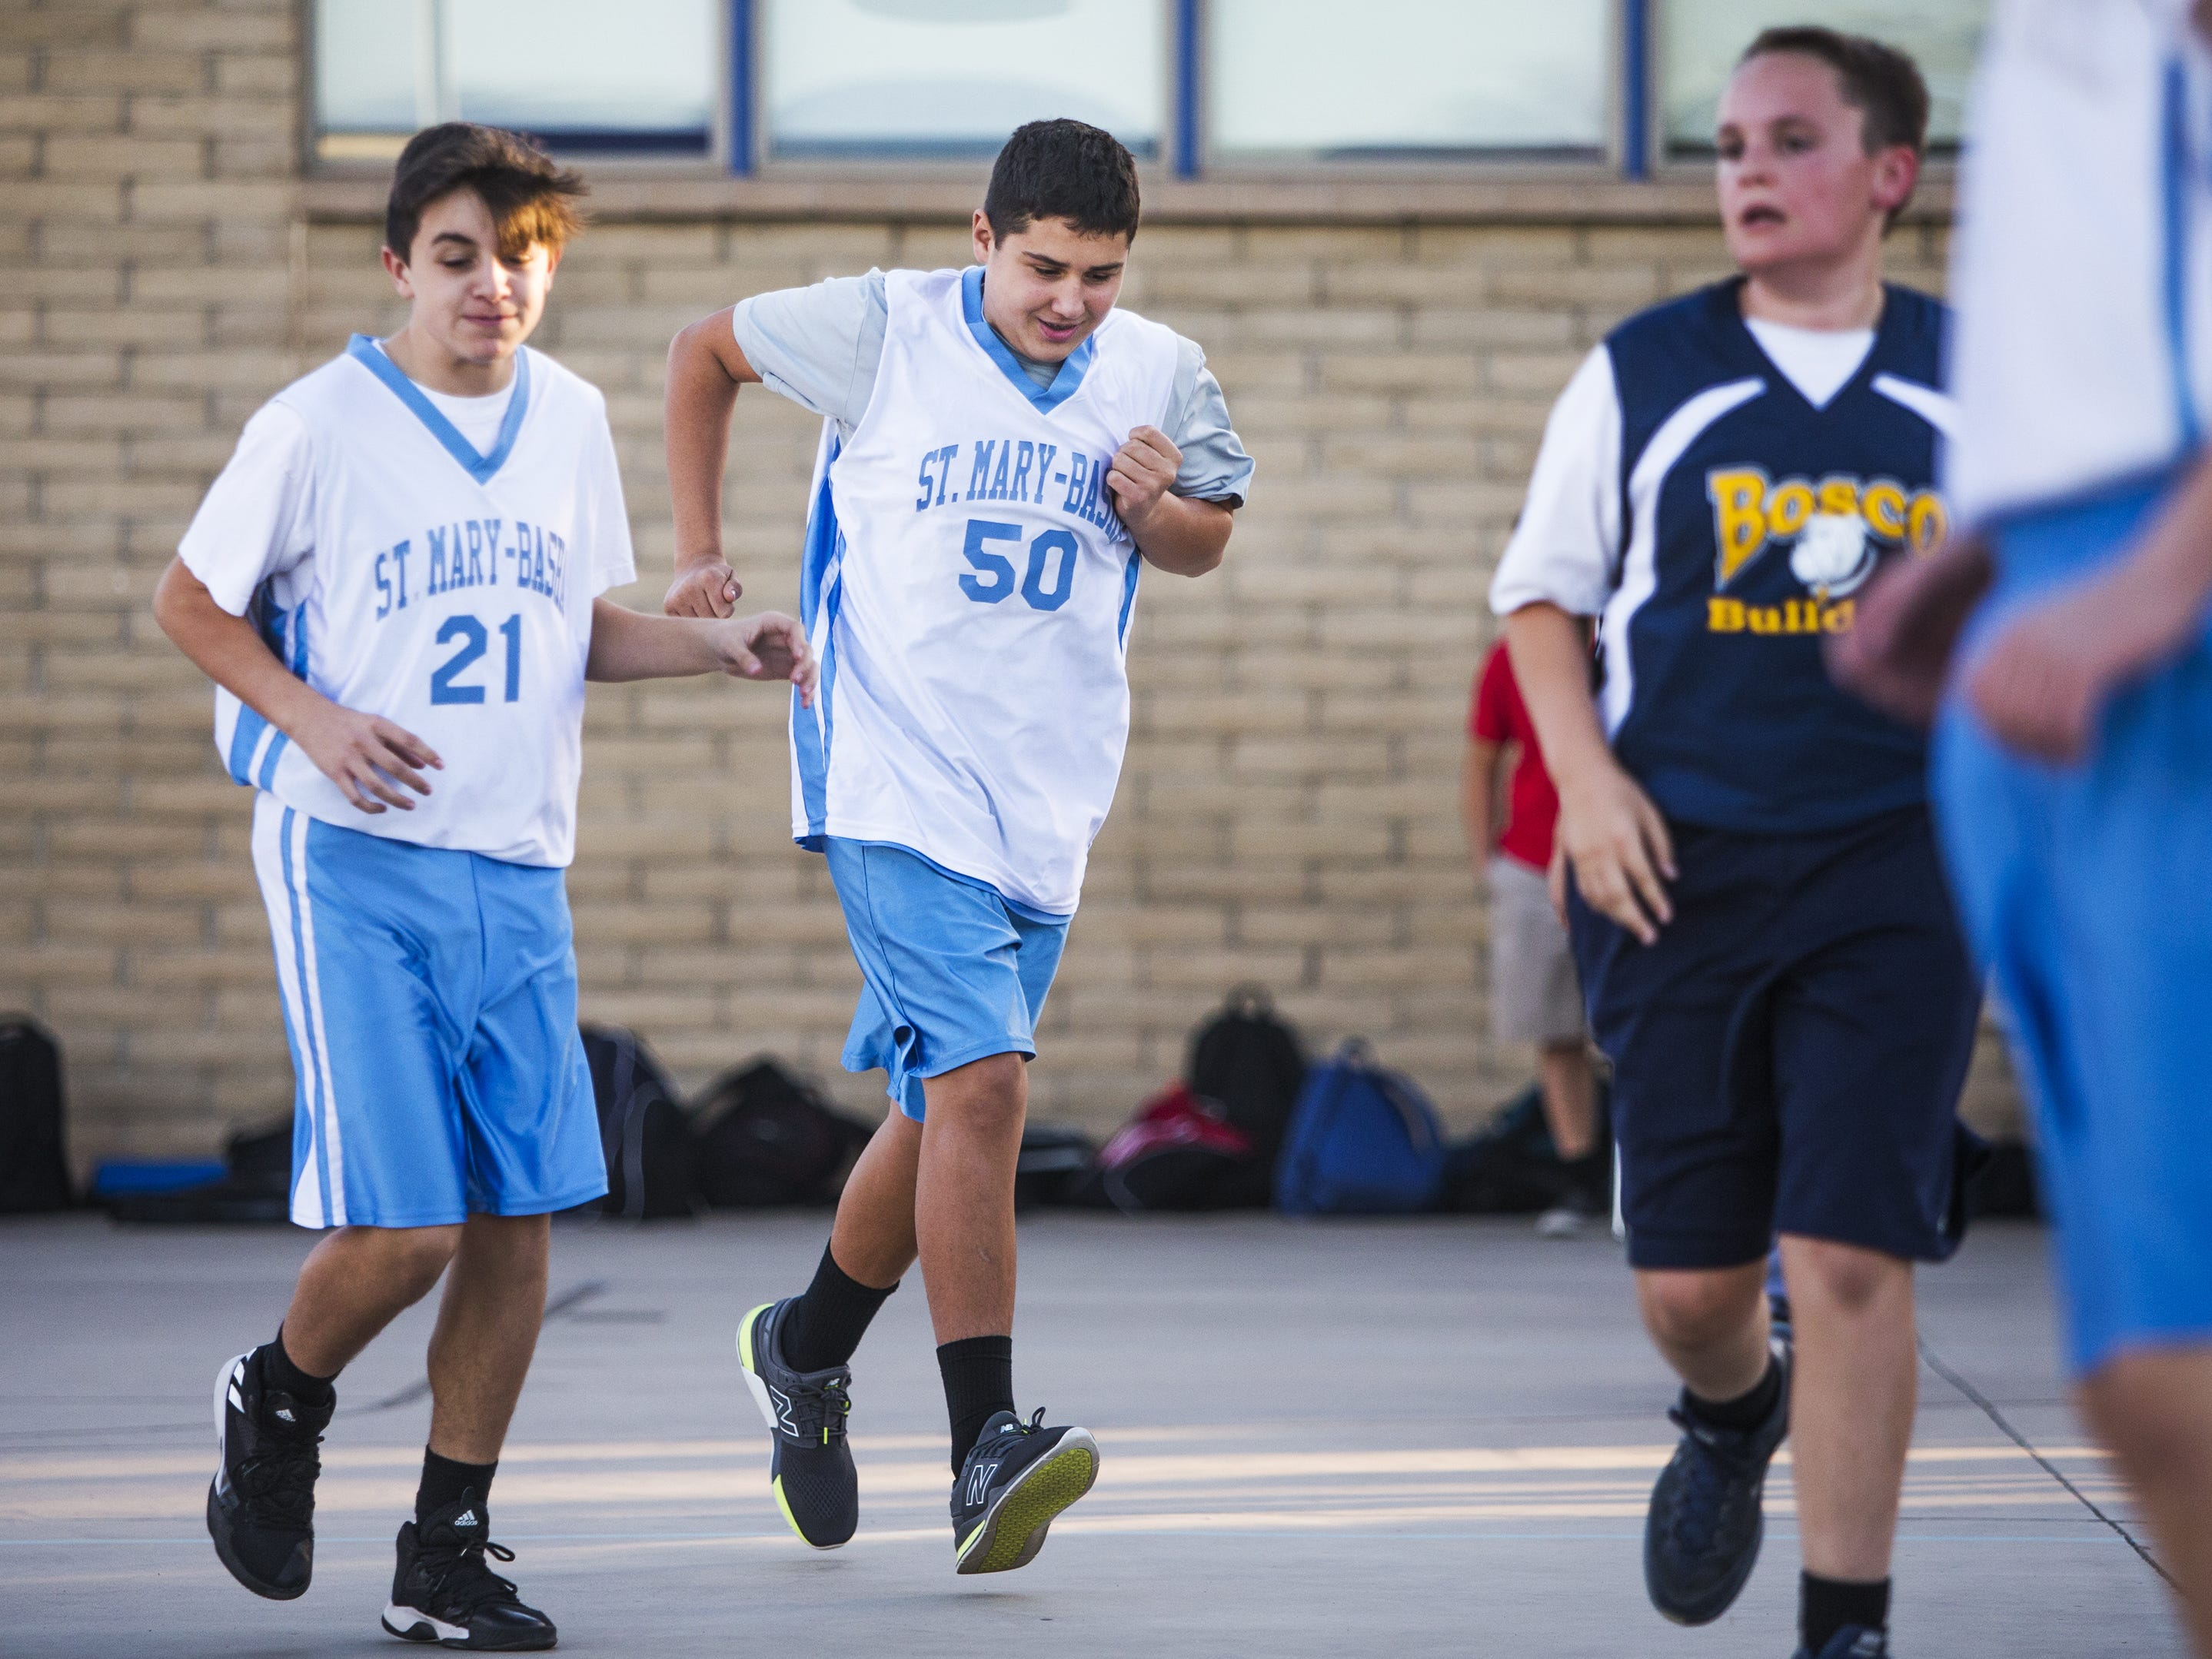 Luke Stockstad, who has autism, #50, runs downcourt for his team, St. Mary-Basha Catholic School, as they play St. John Bosco, Tuesday, November 27, 2018.